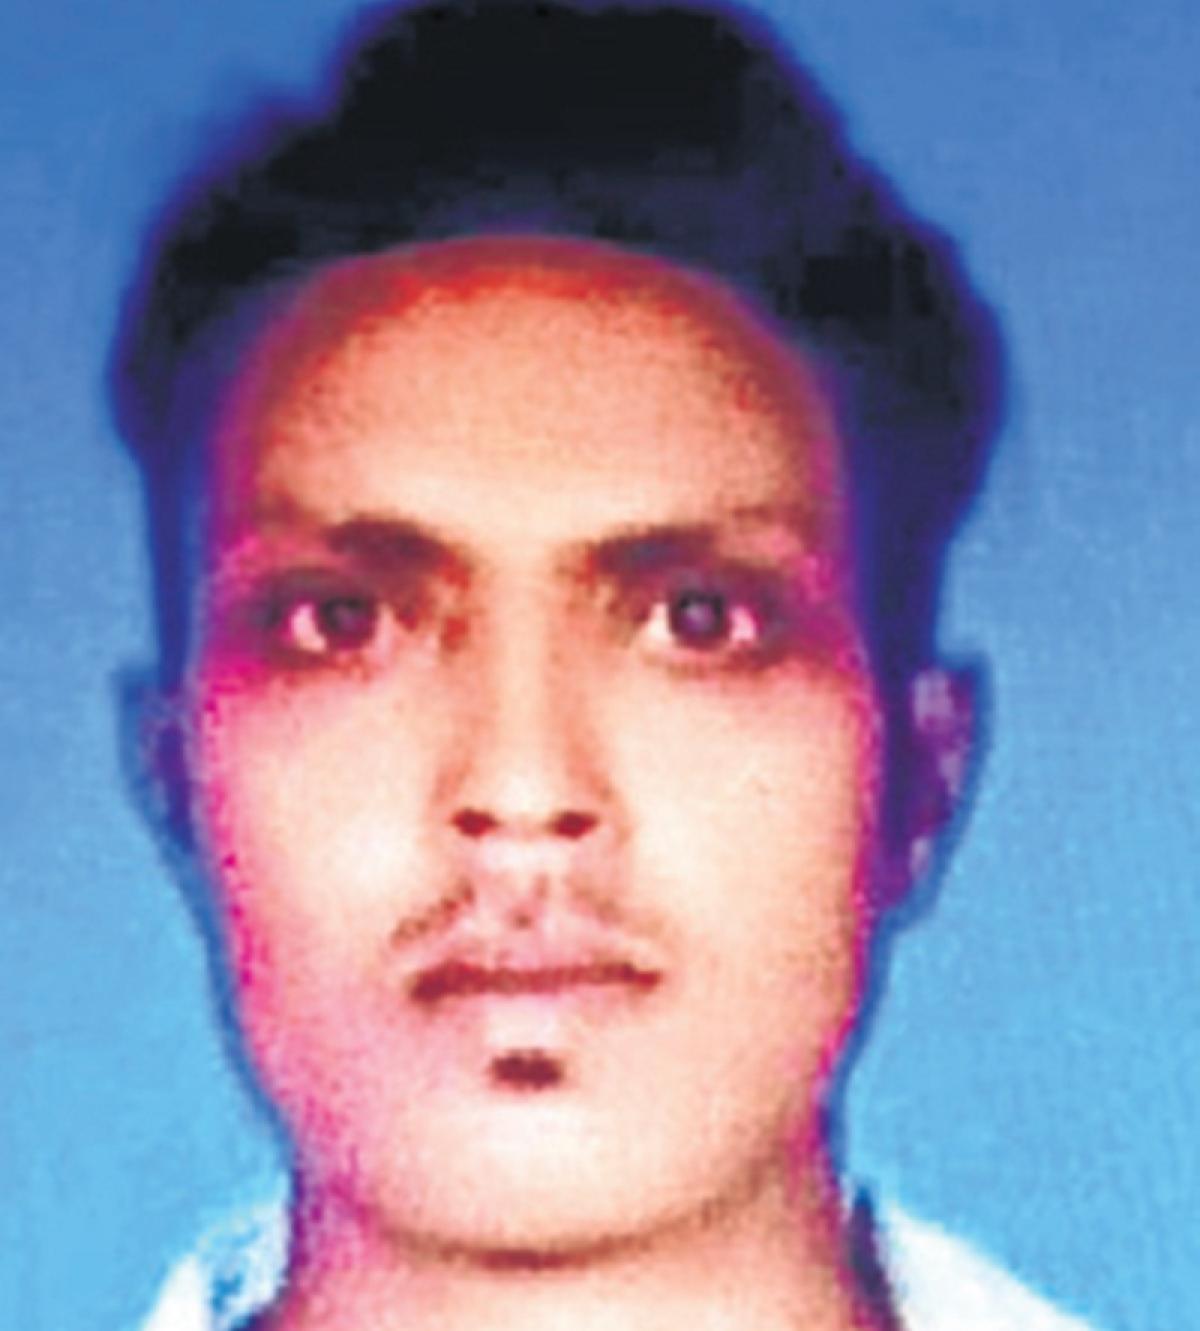 Indore: Union social justice minister demands CBI probe